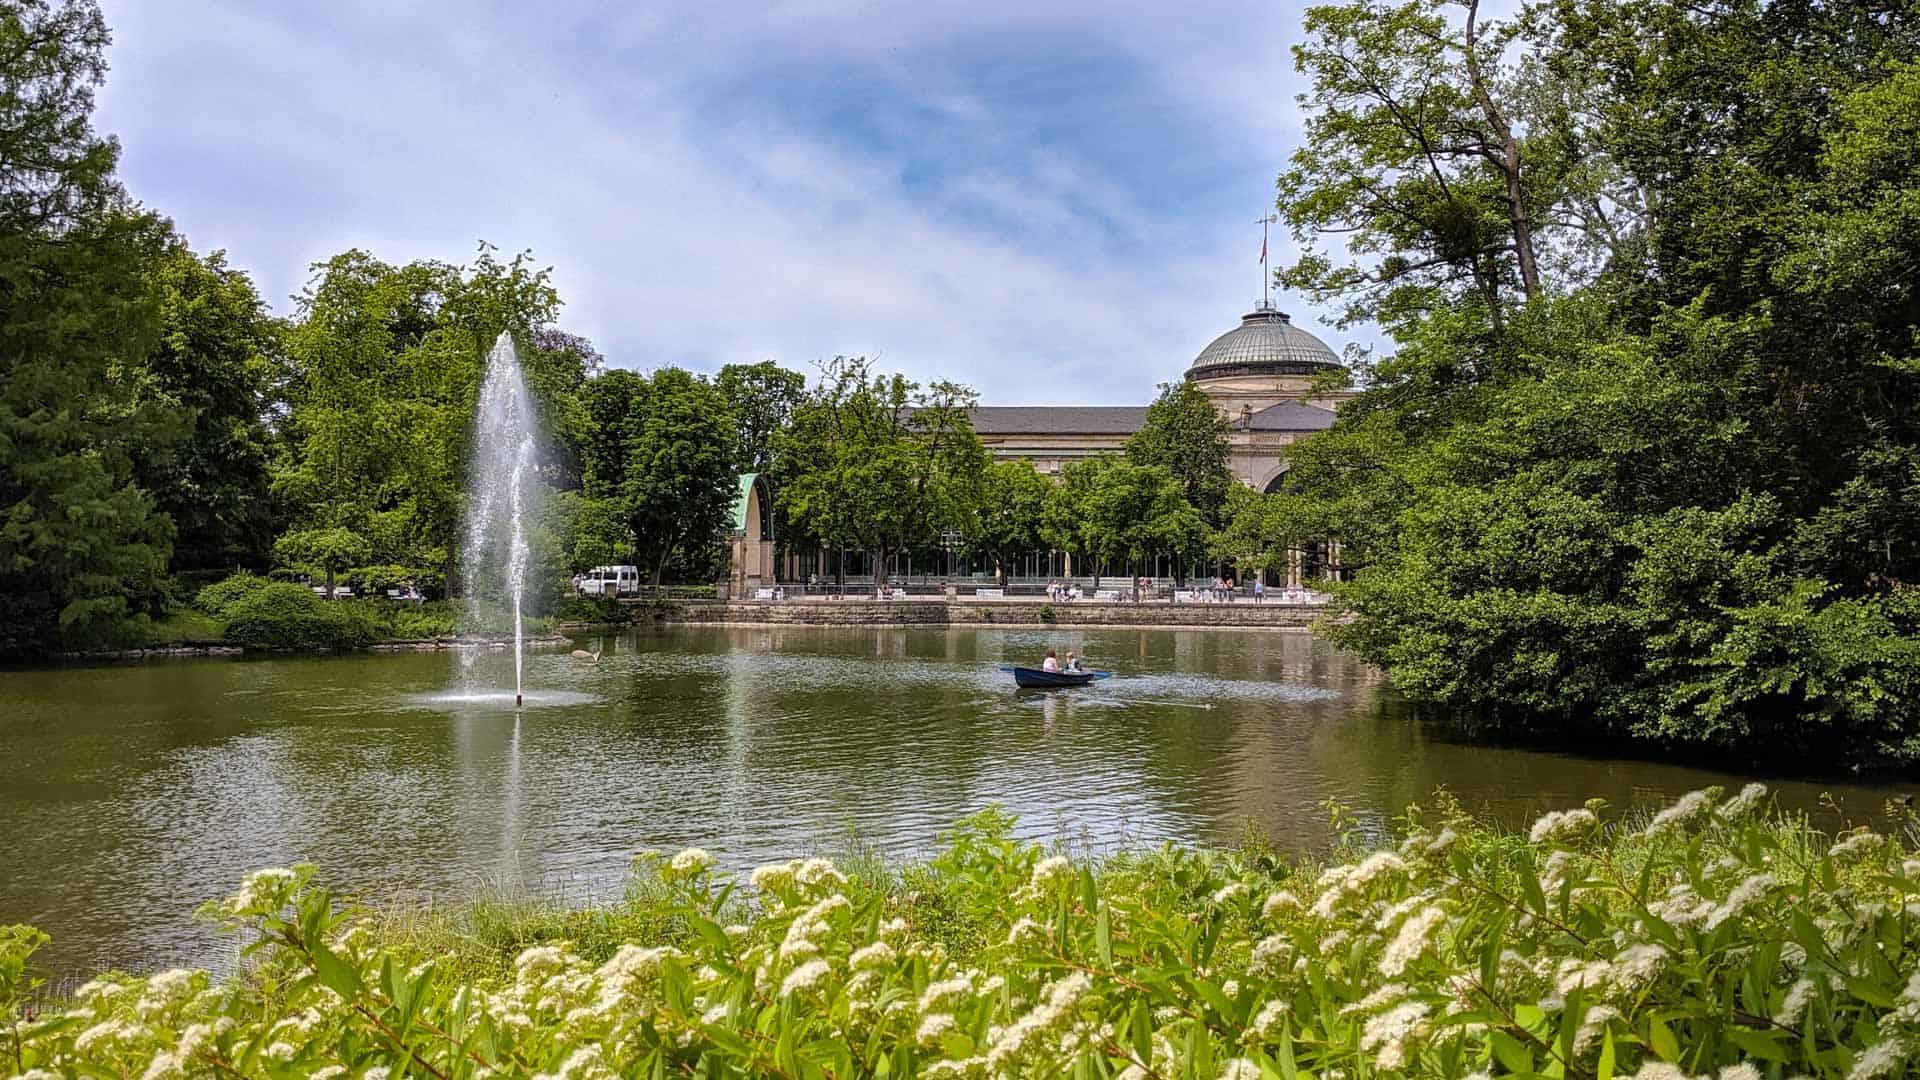 View of the lake in the Kurpark in Wiesbaden